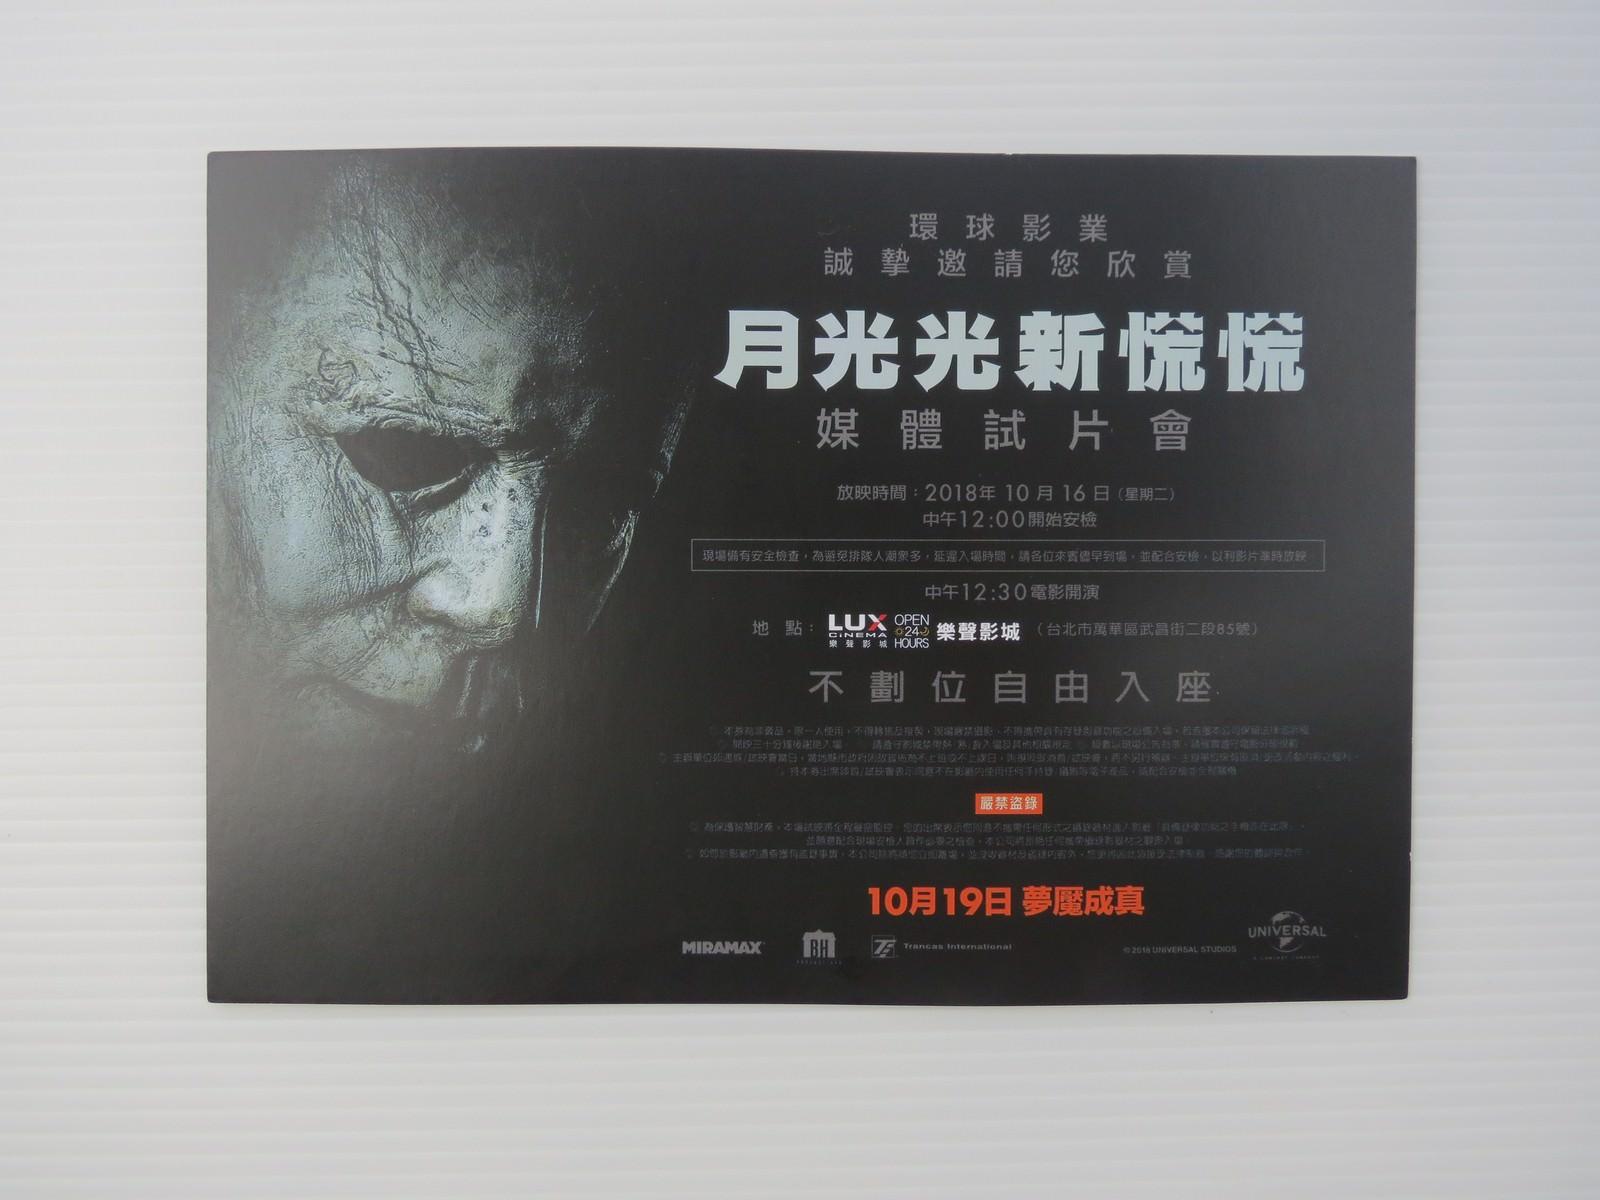 Movie, Halloween(美國, 2018年) / 月光光新慌慌(台灣) / 月光光心慌慌(香港), 廣告看板, 特映會邀請卡